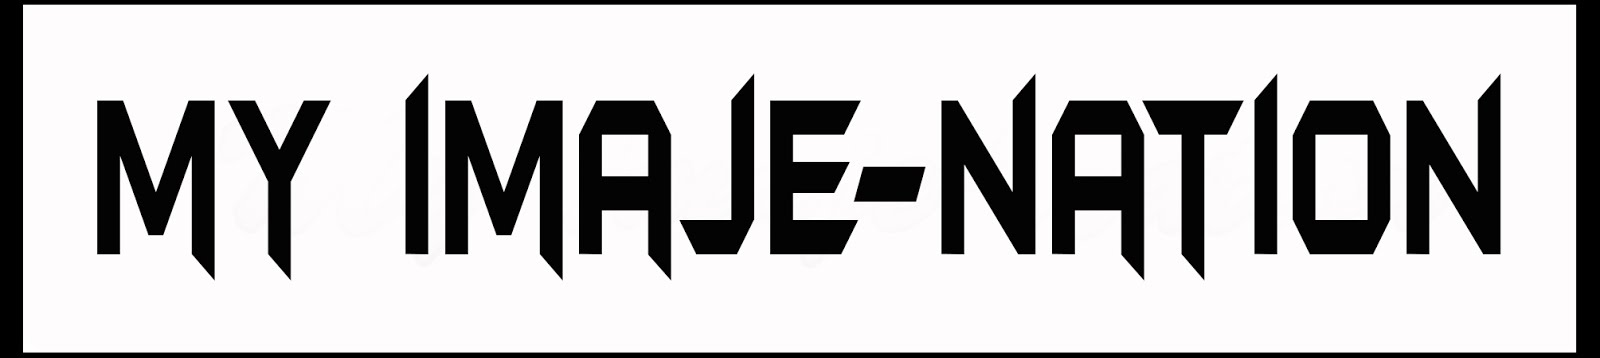 IMAJE-NATION